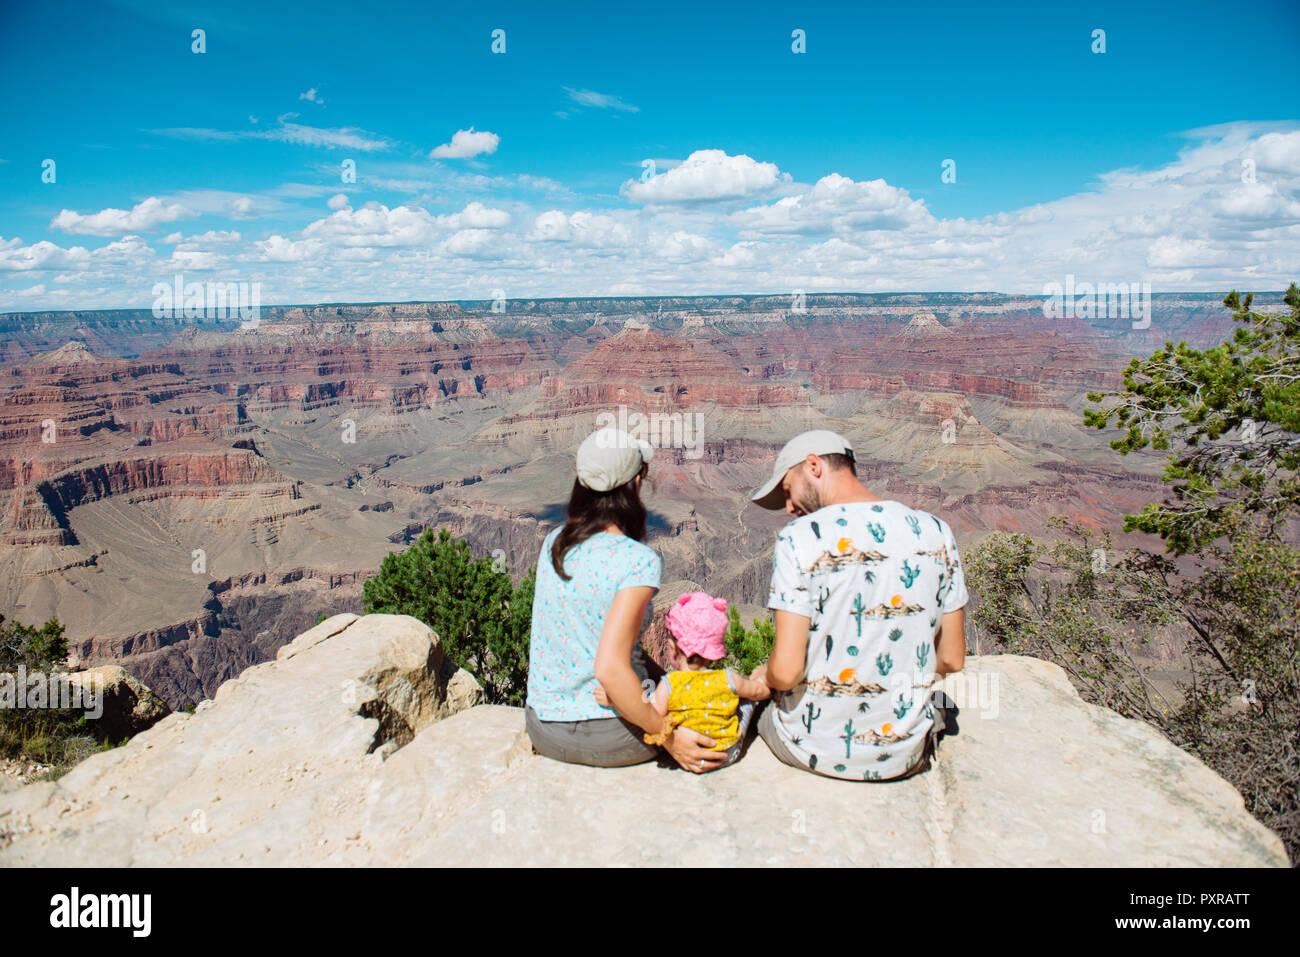 USA, Arizona, Grand Canyon National Park, South Rim, Family sitting on viewpoint - Stock Image